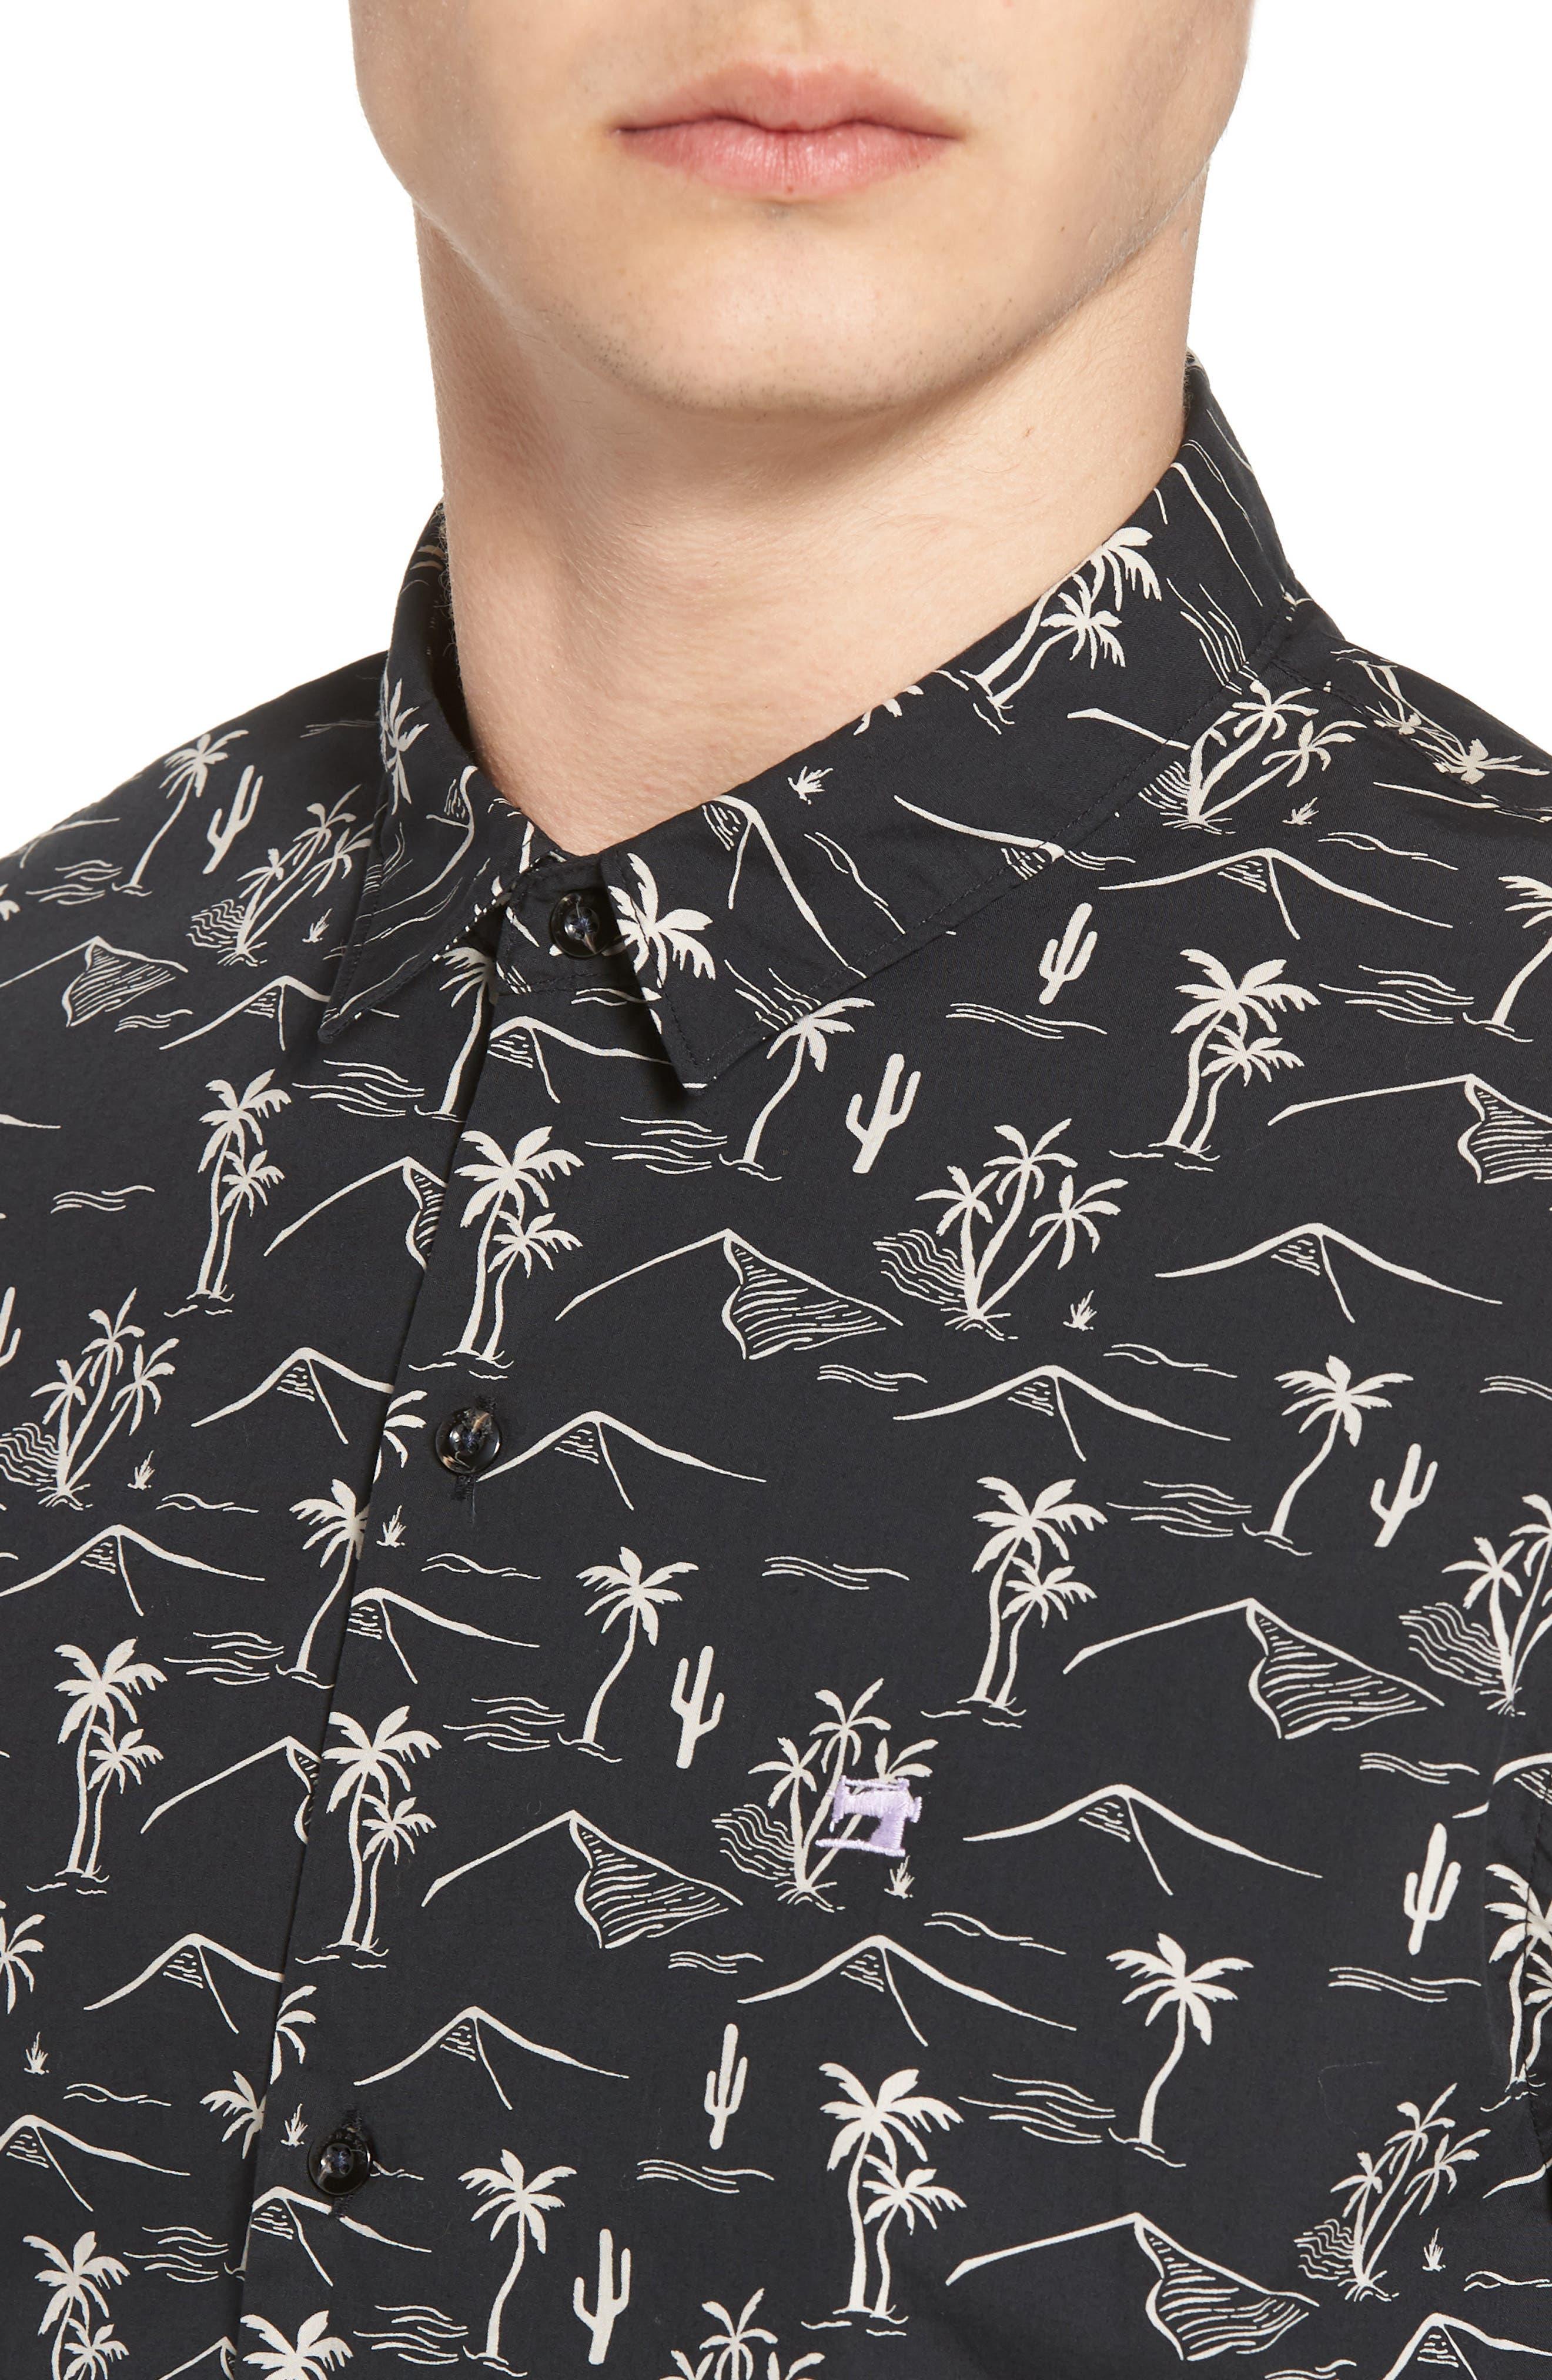 Poolside Woven Shirt,                             Alternate thumbnail 4, color,                             002